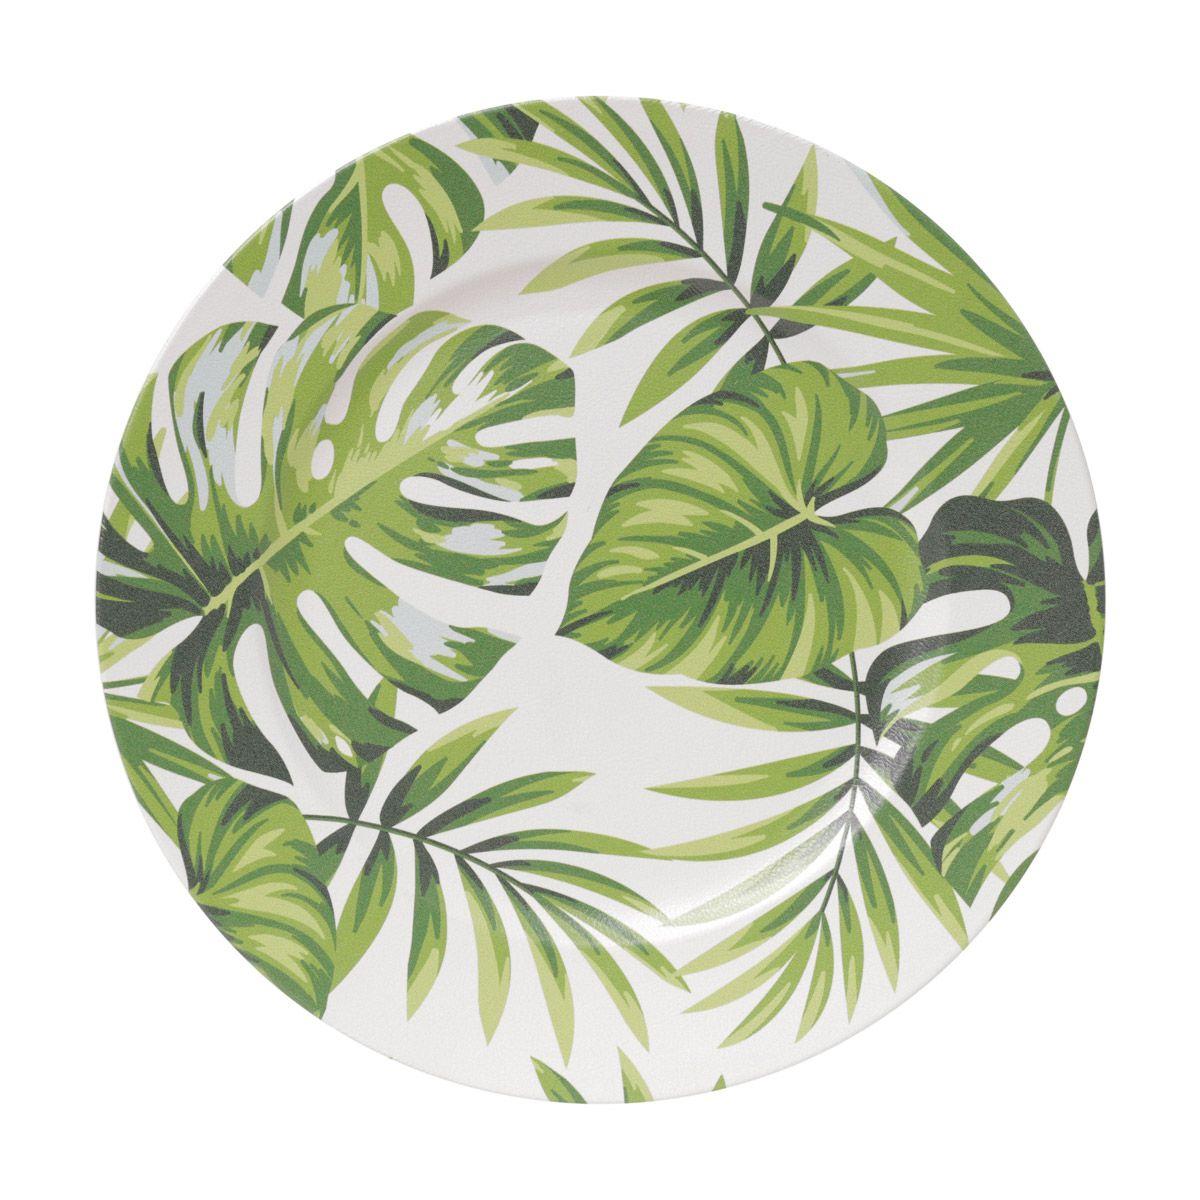 Jogo 6 peças Sousplat 33 cm de plástico verde e branco Leaf Lyor - L4295